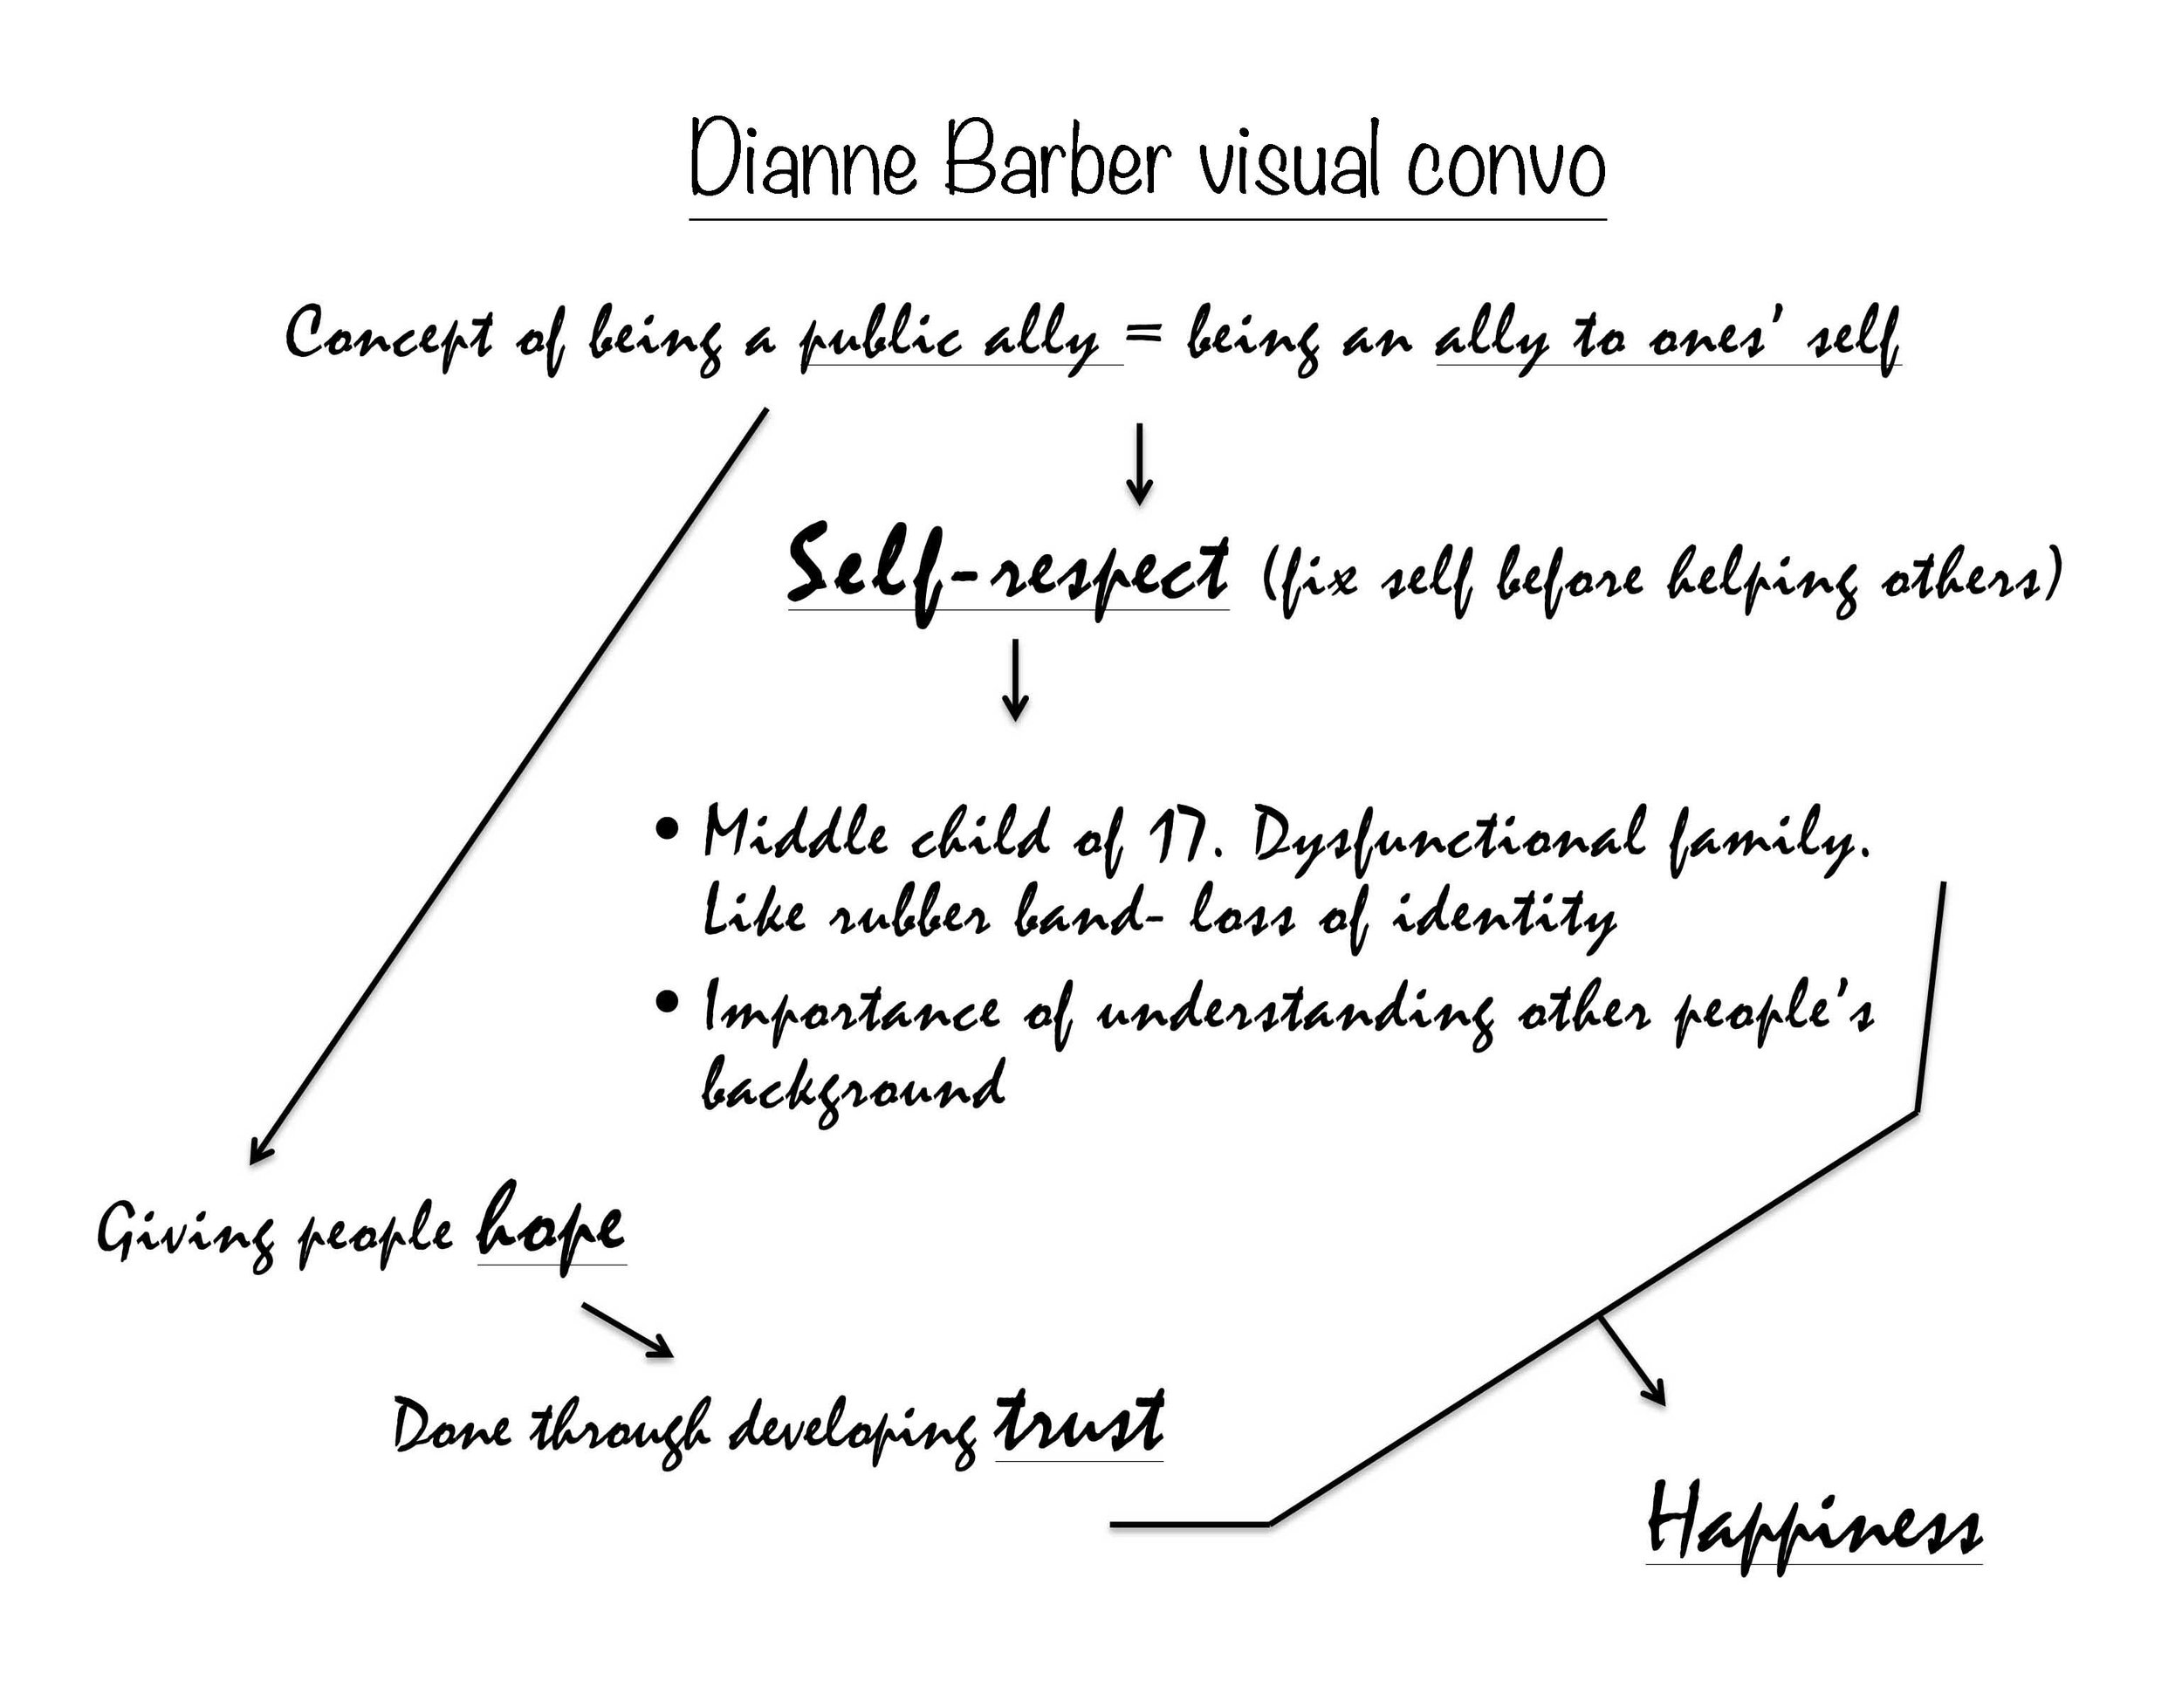 10 Dianne Barber visual convo.jpg